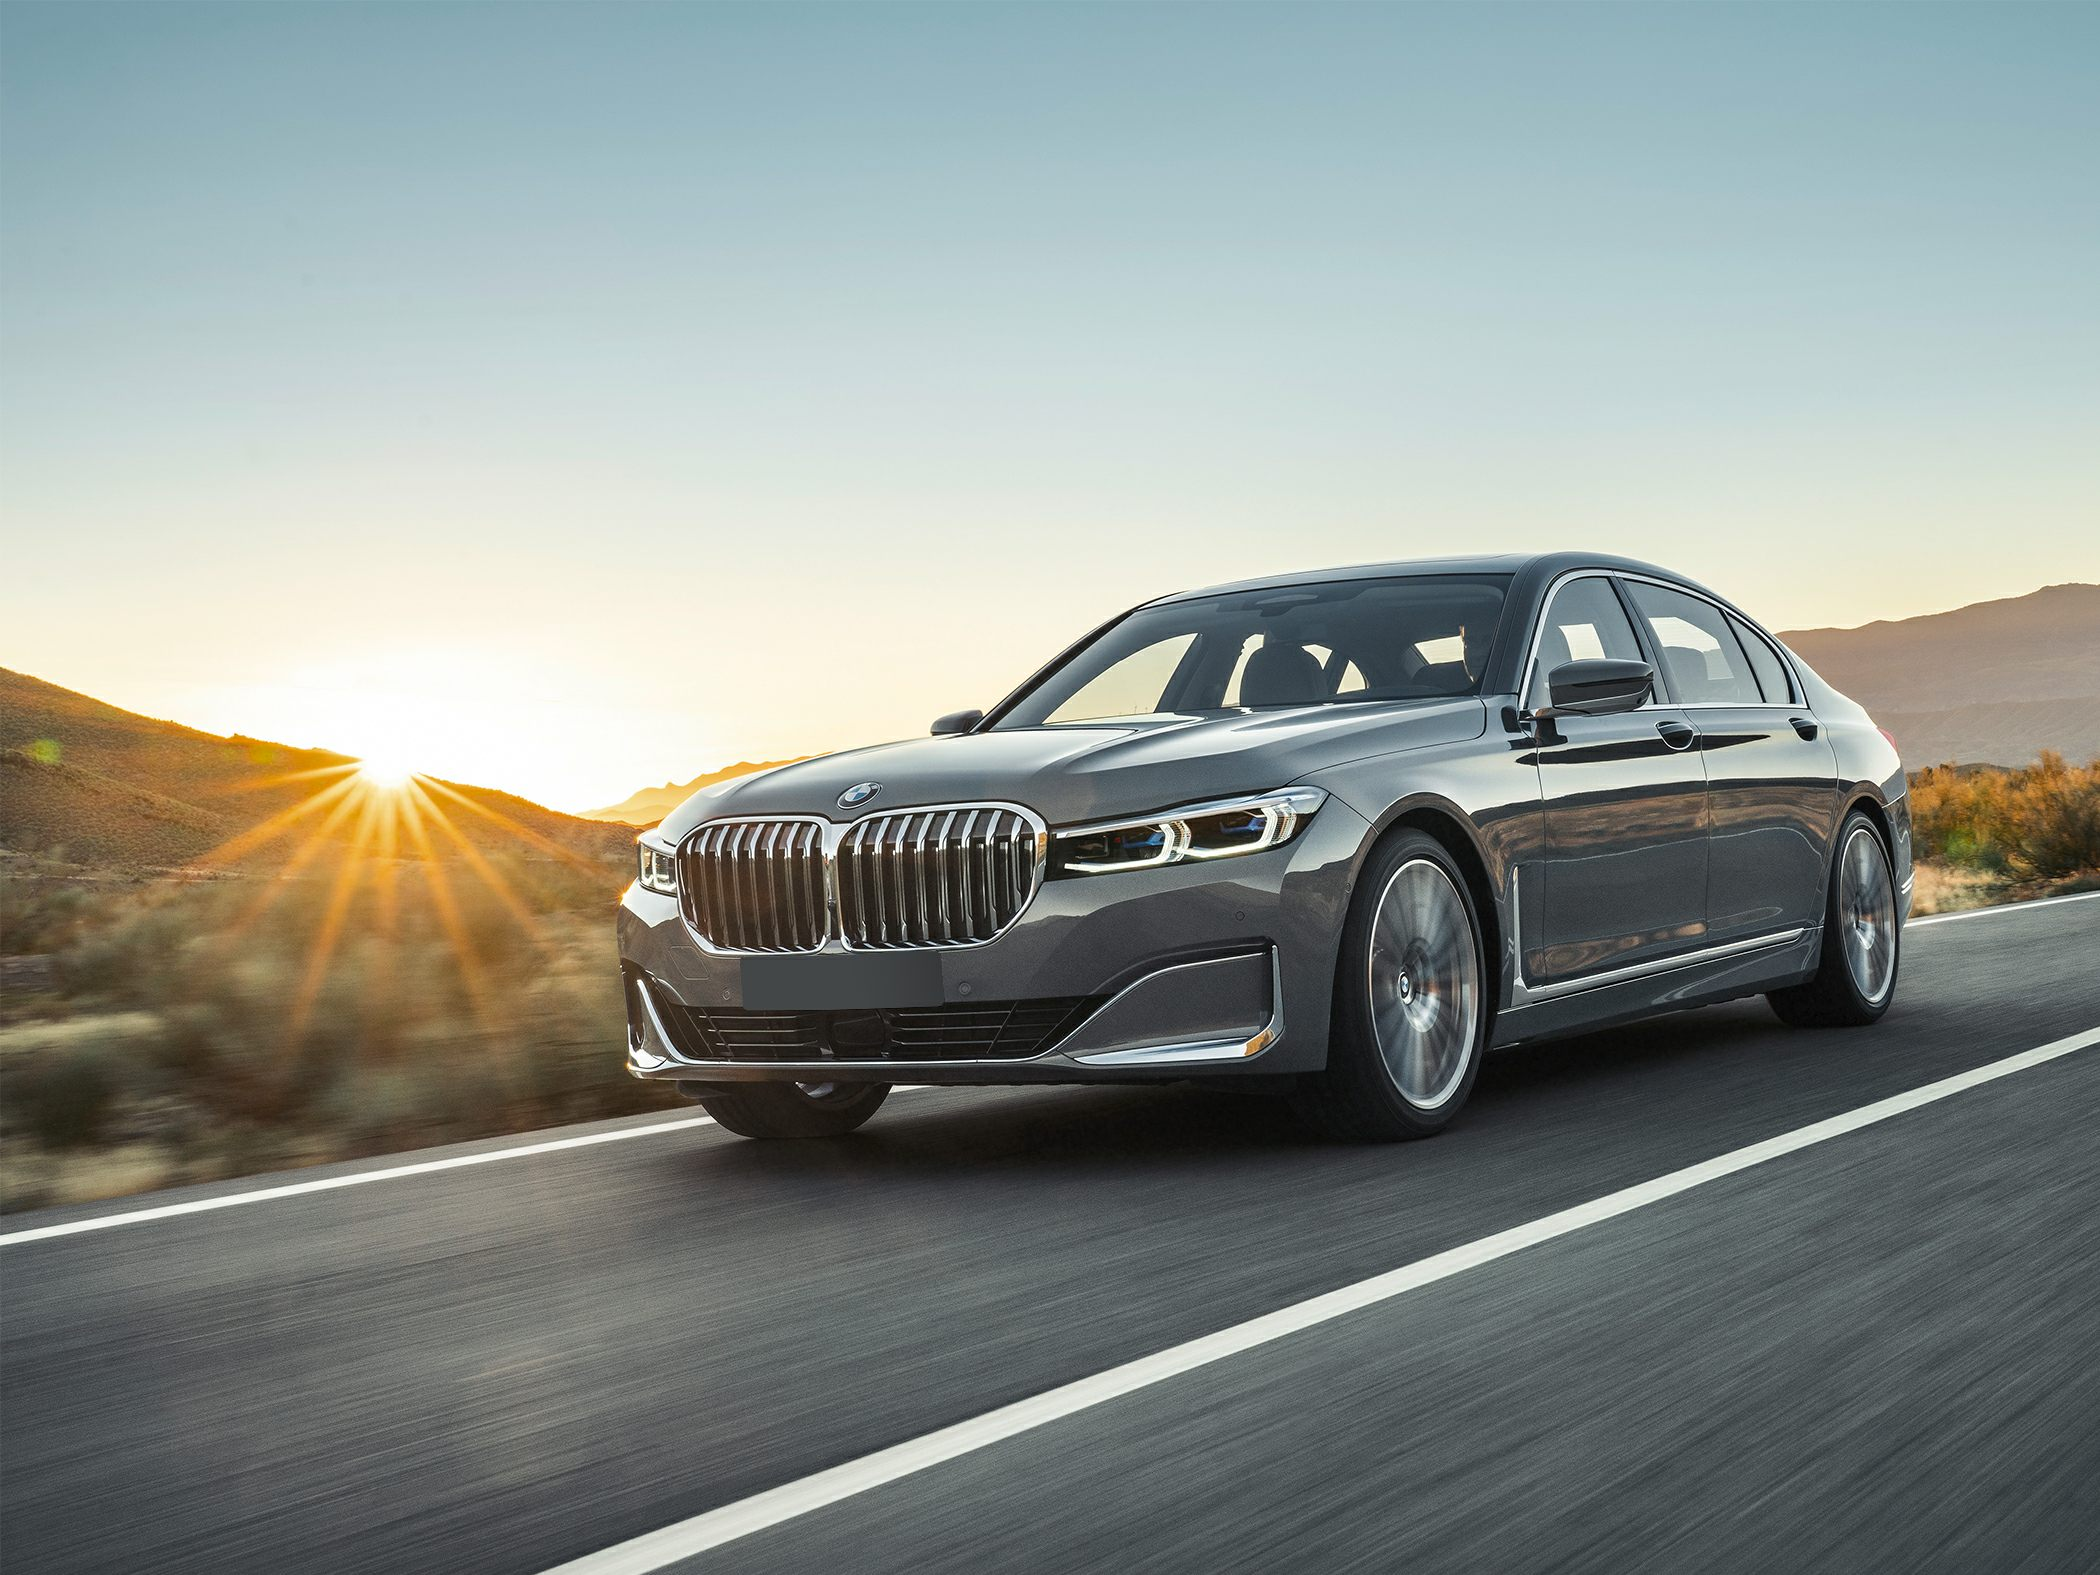 e34c6cca8117 BMW unveils refreshed 2020 7 Series - Autoblog